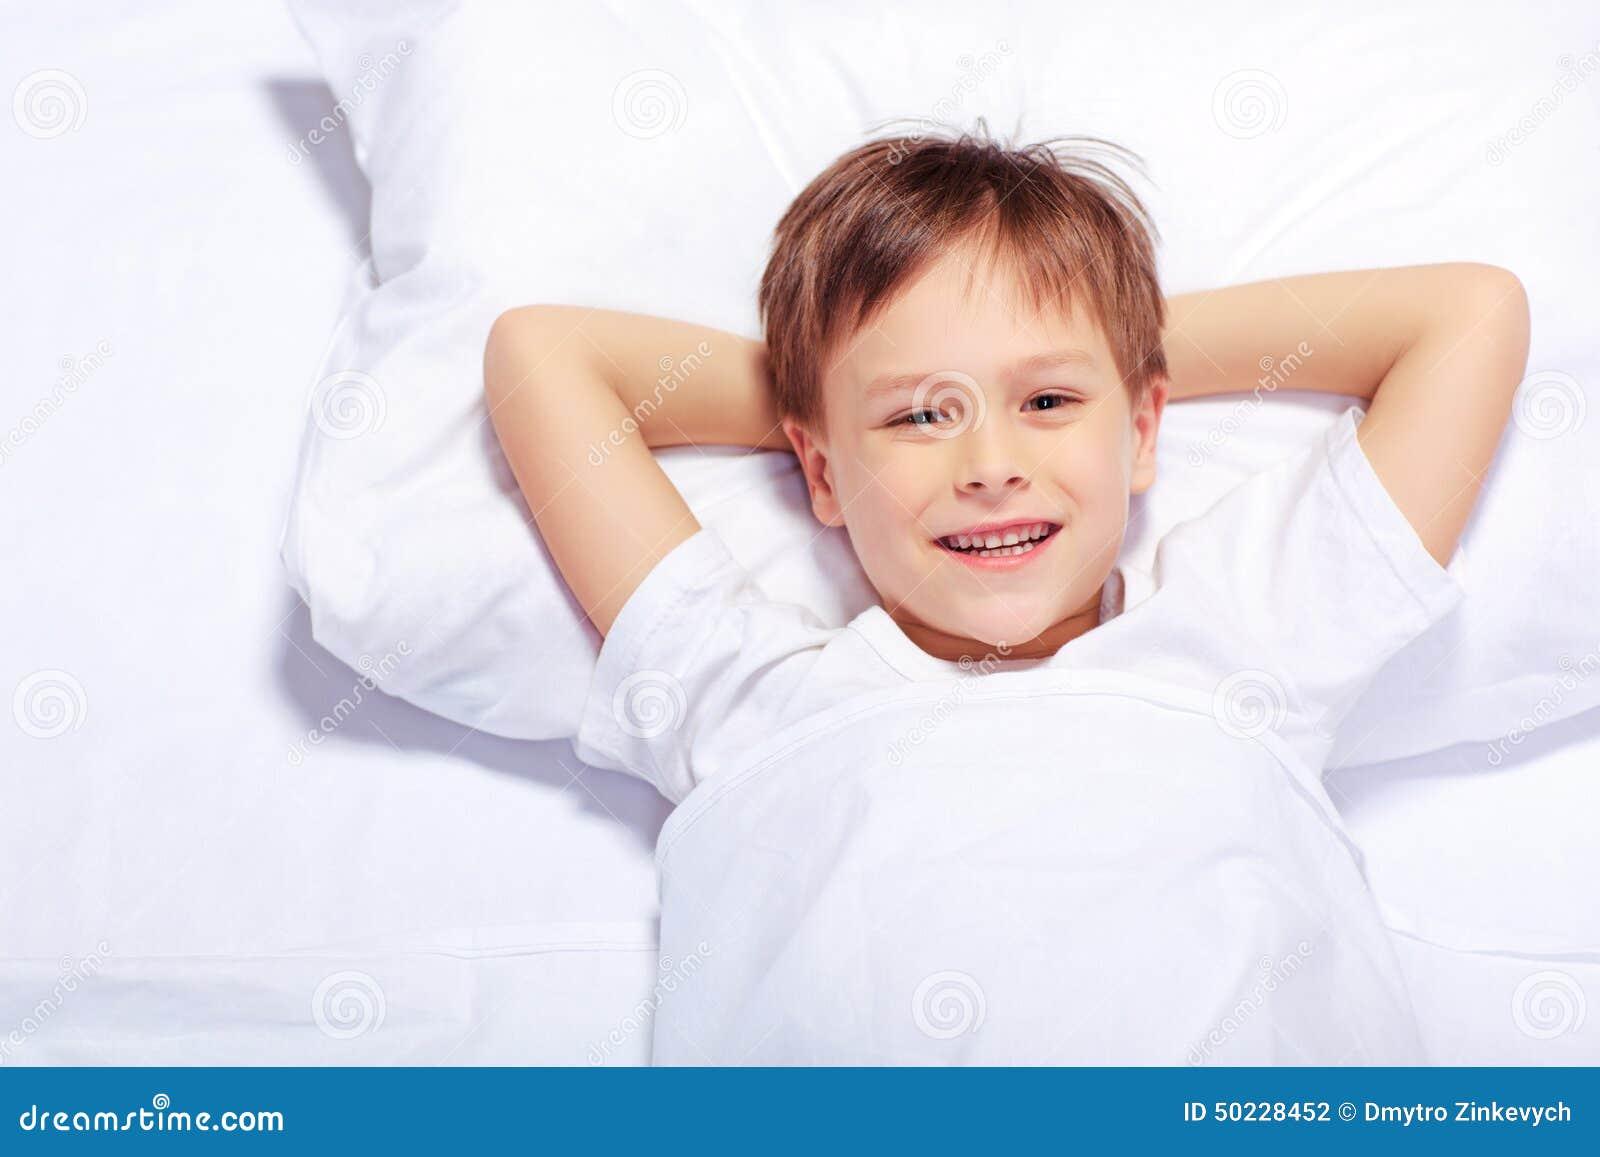 Portrait Of A Cute Emotional Little Boy In Bed Stock Photo ...